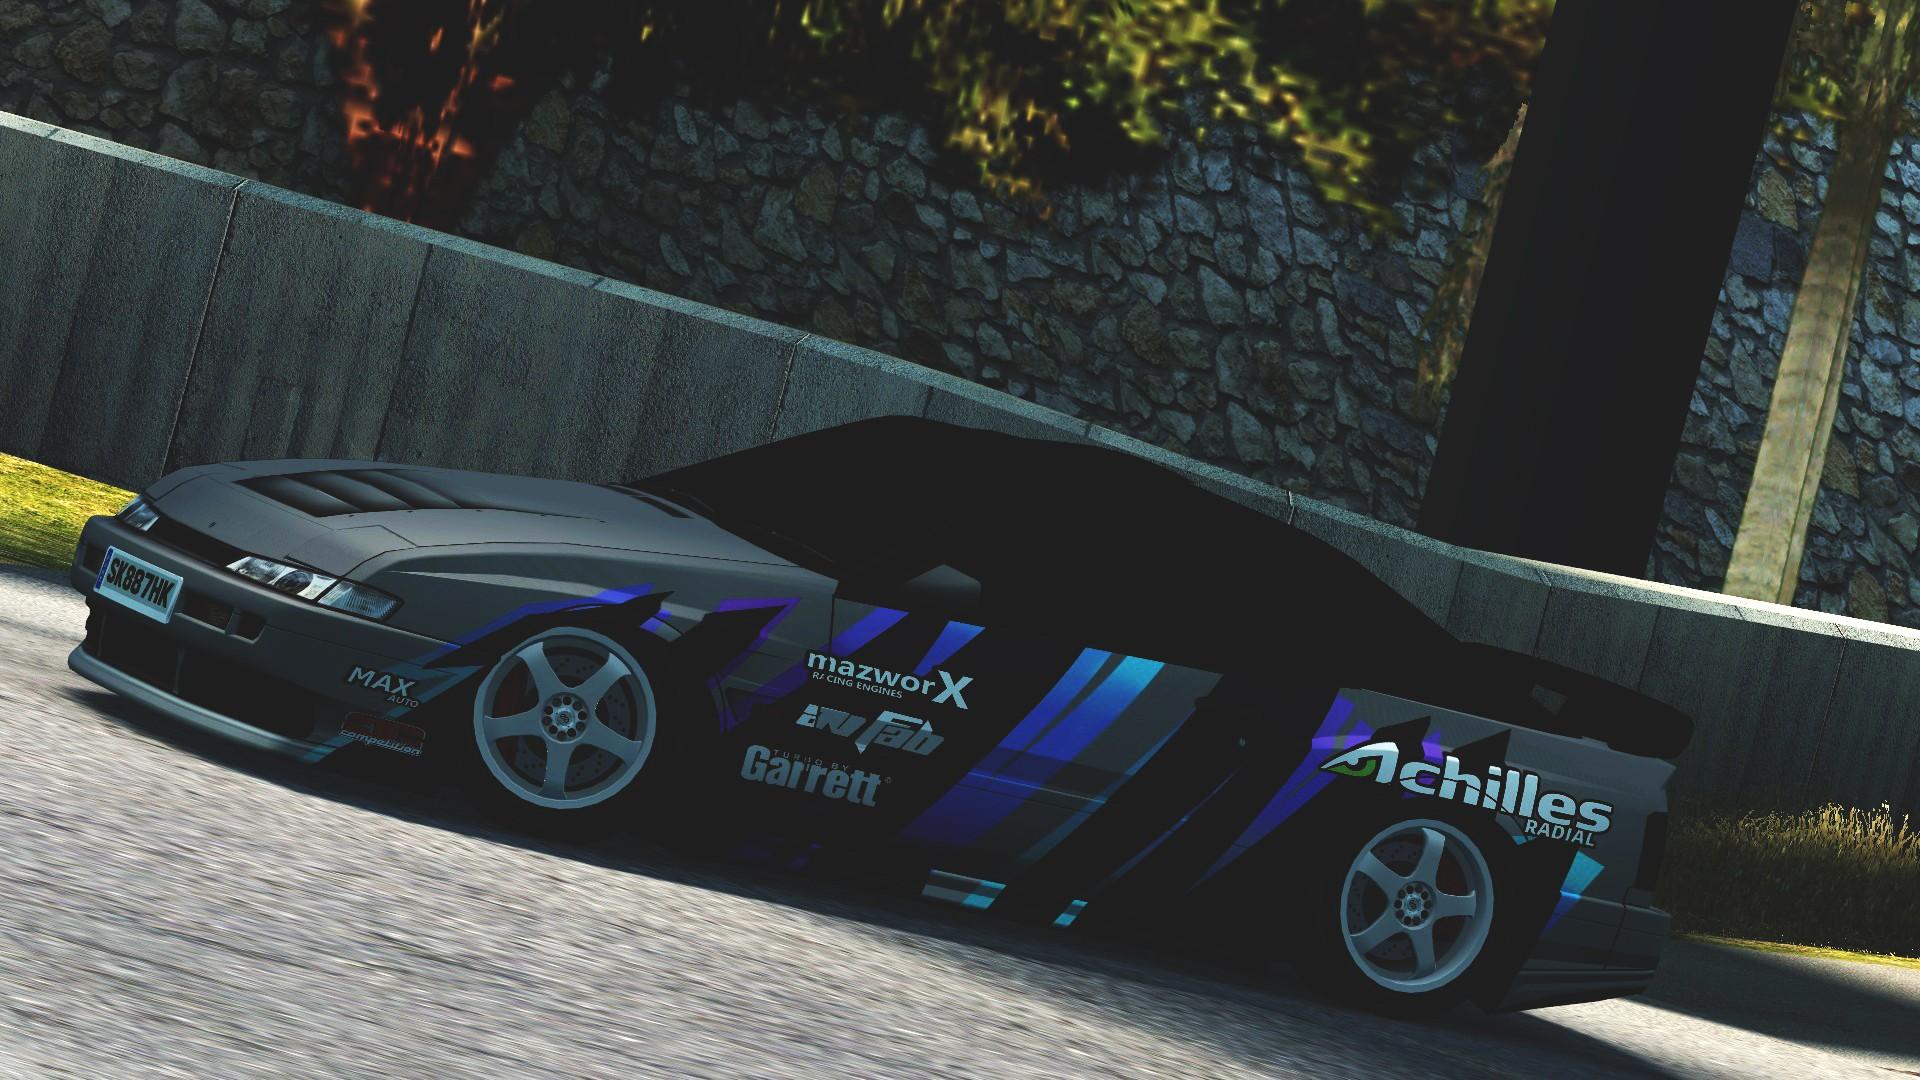 Wallpaper Sports Car Nissan Silvia Performance Car Live For